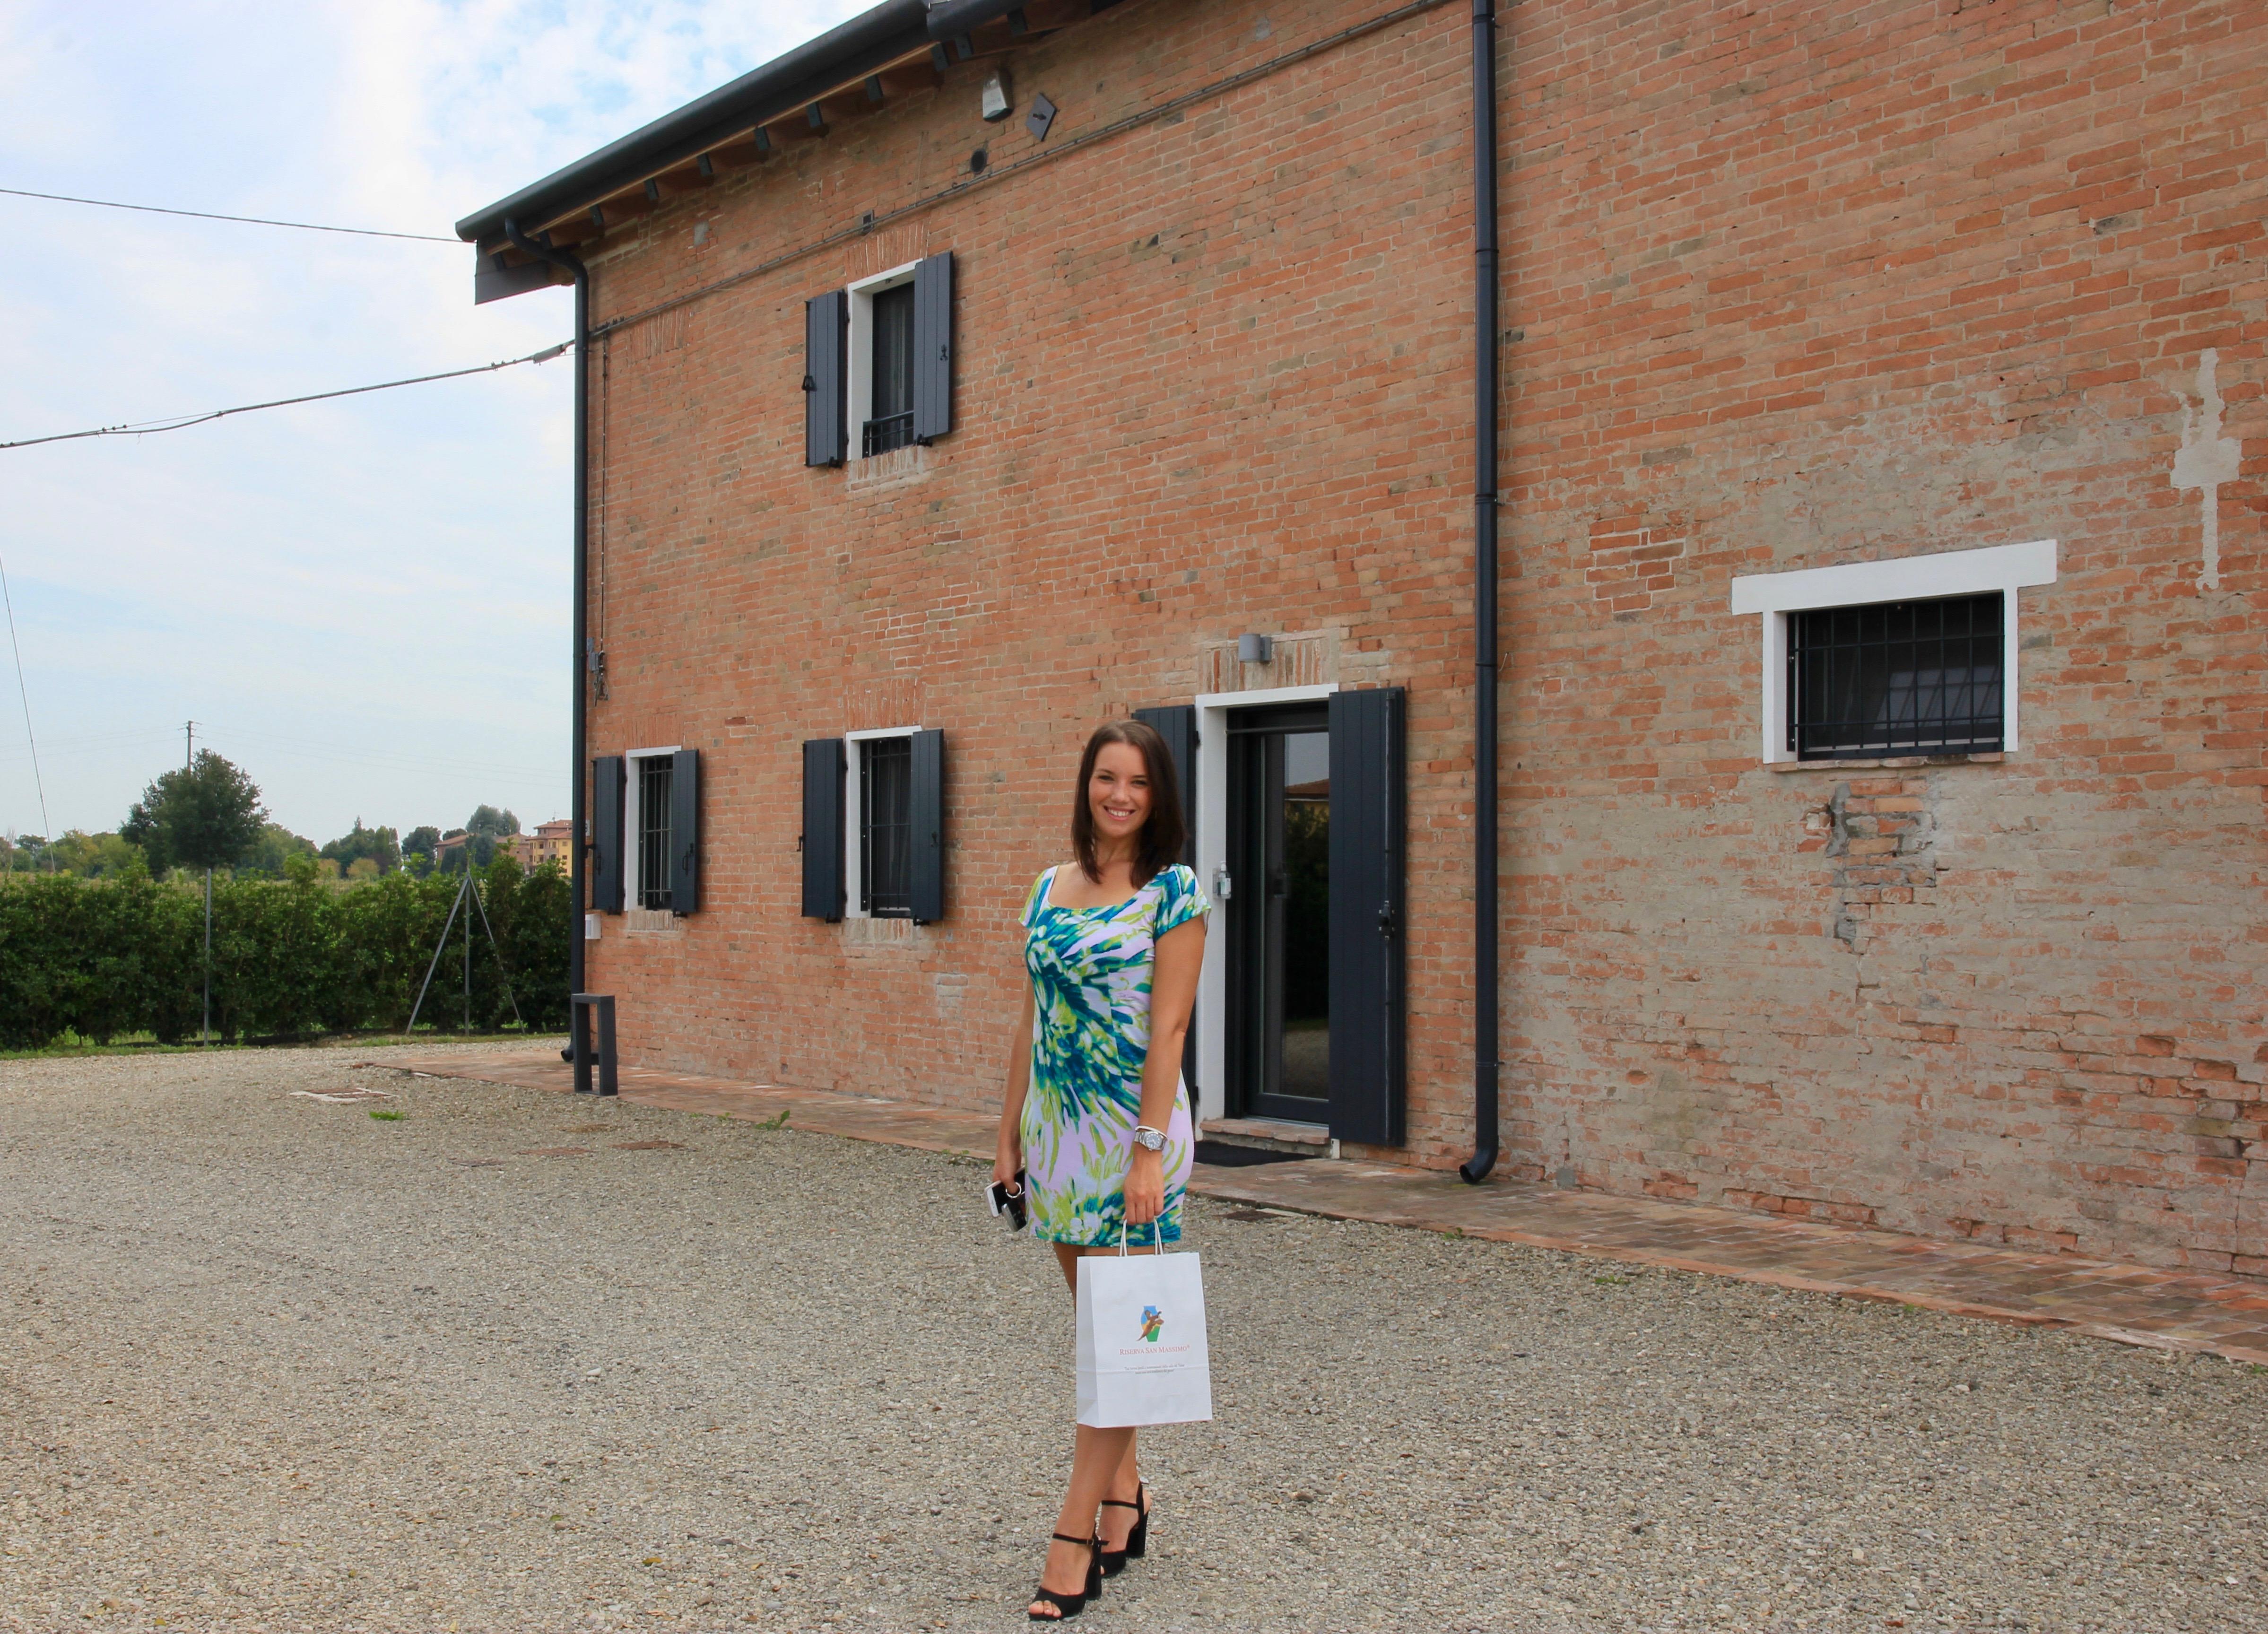 Modena - Balsamico Bonini